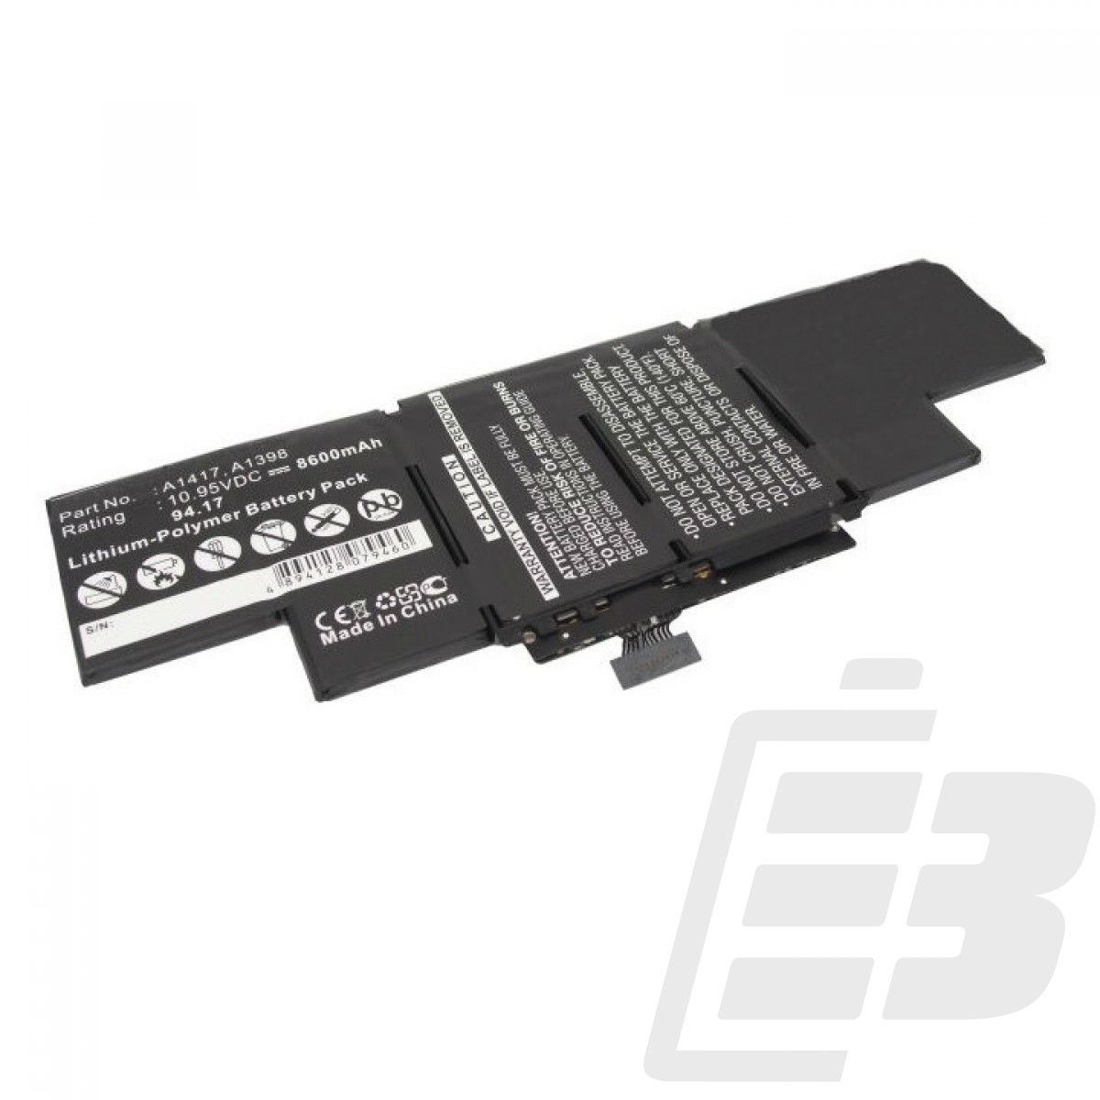 Laptop battery Apple MacBook Pro 15 Retina 2013_1